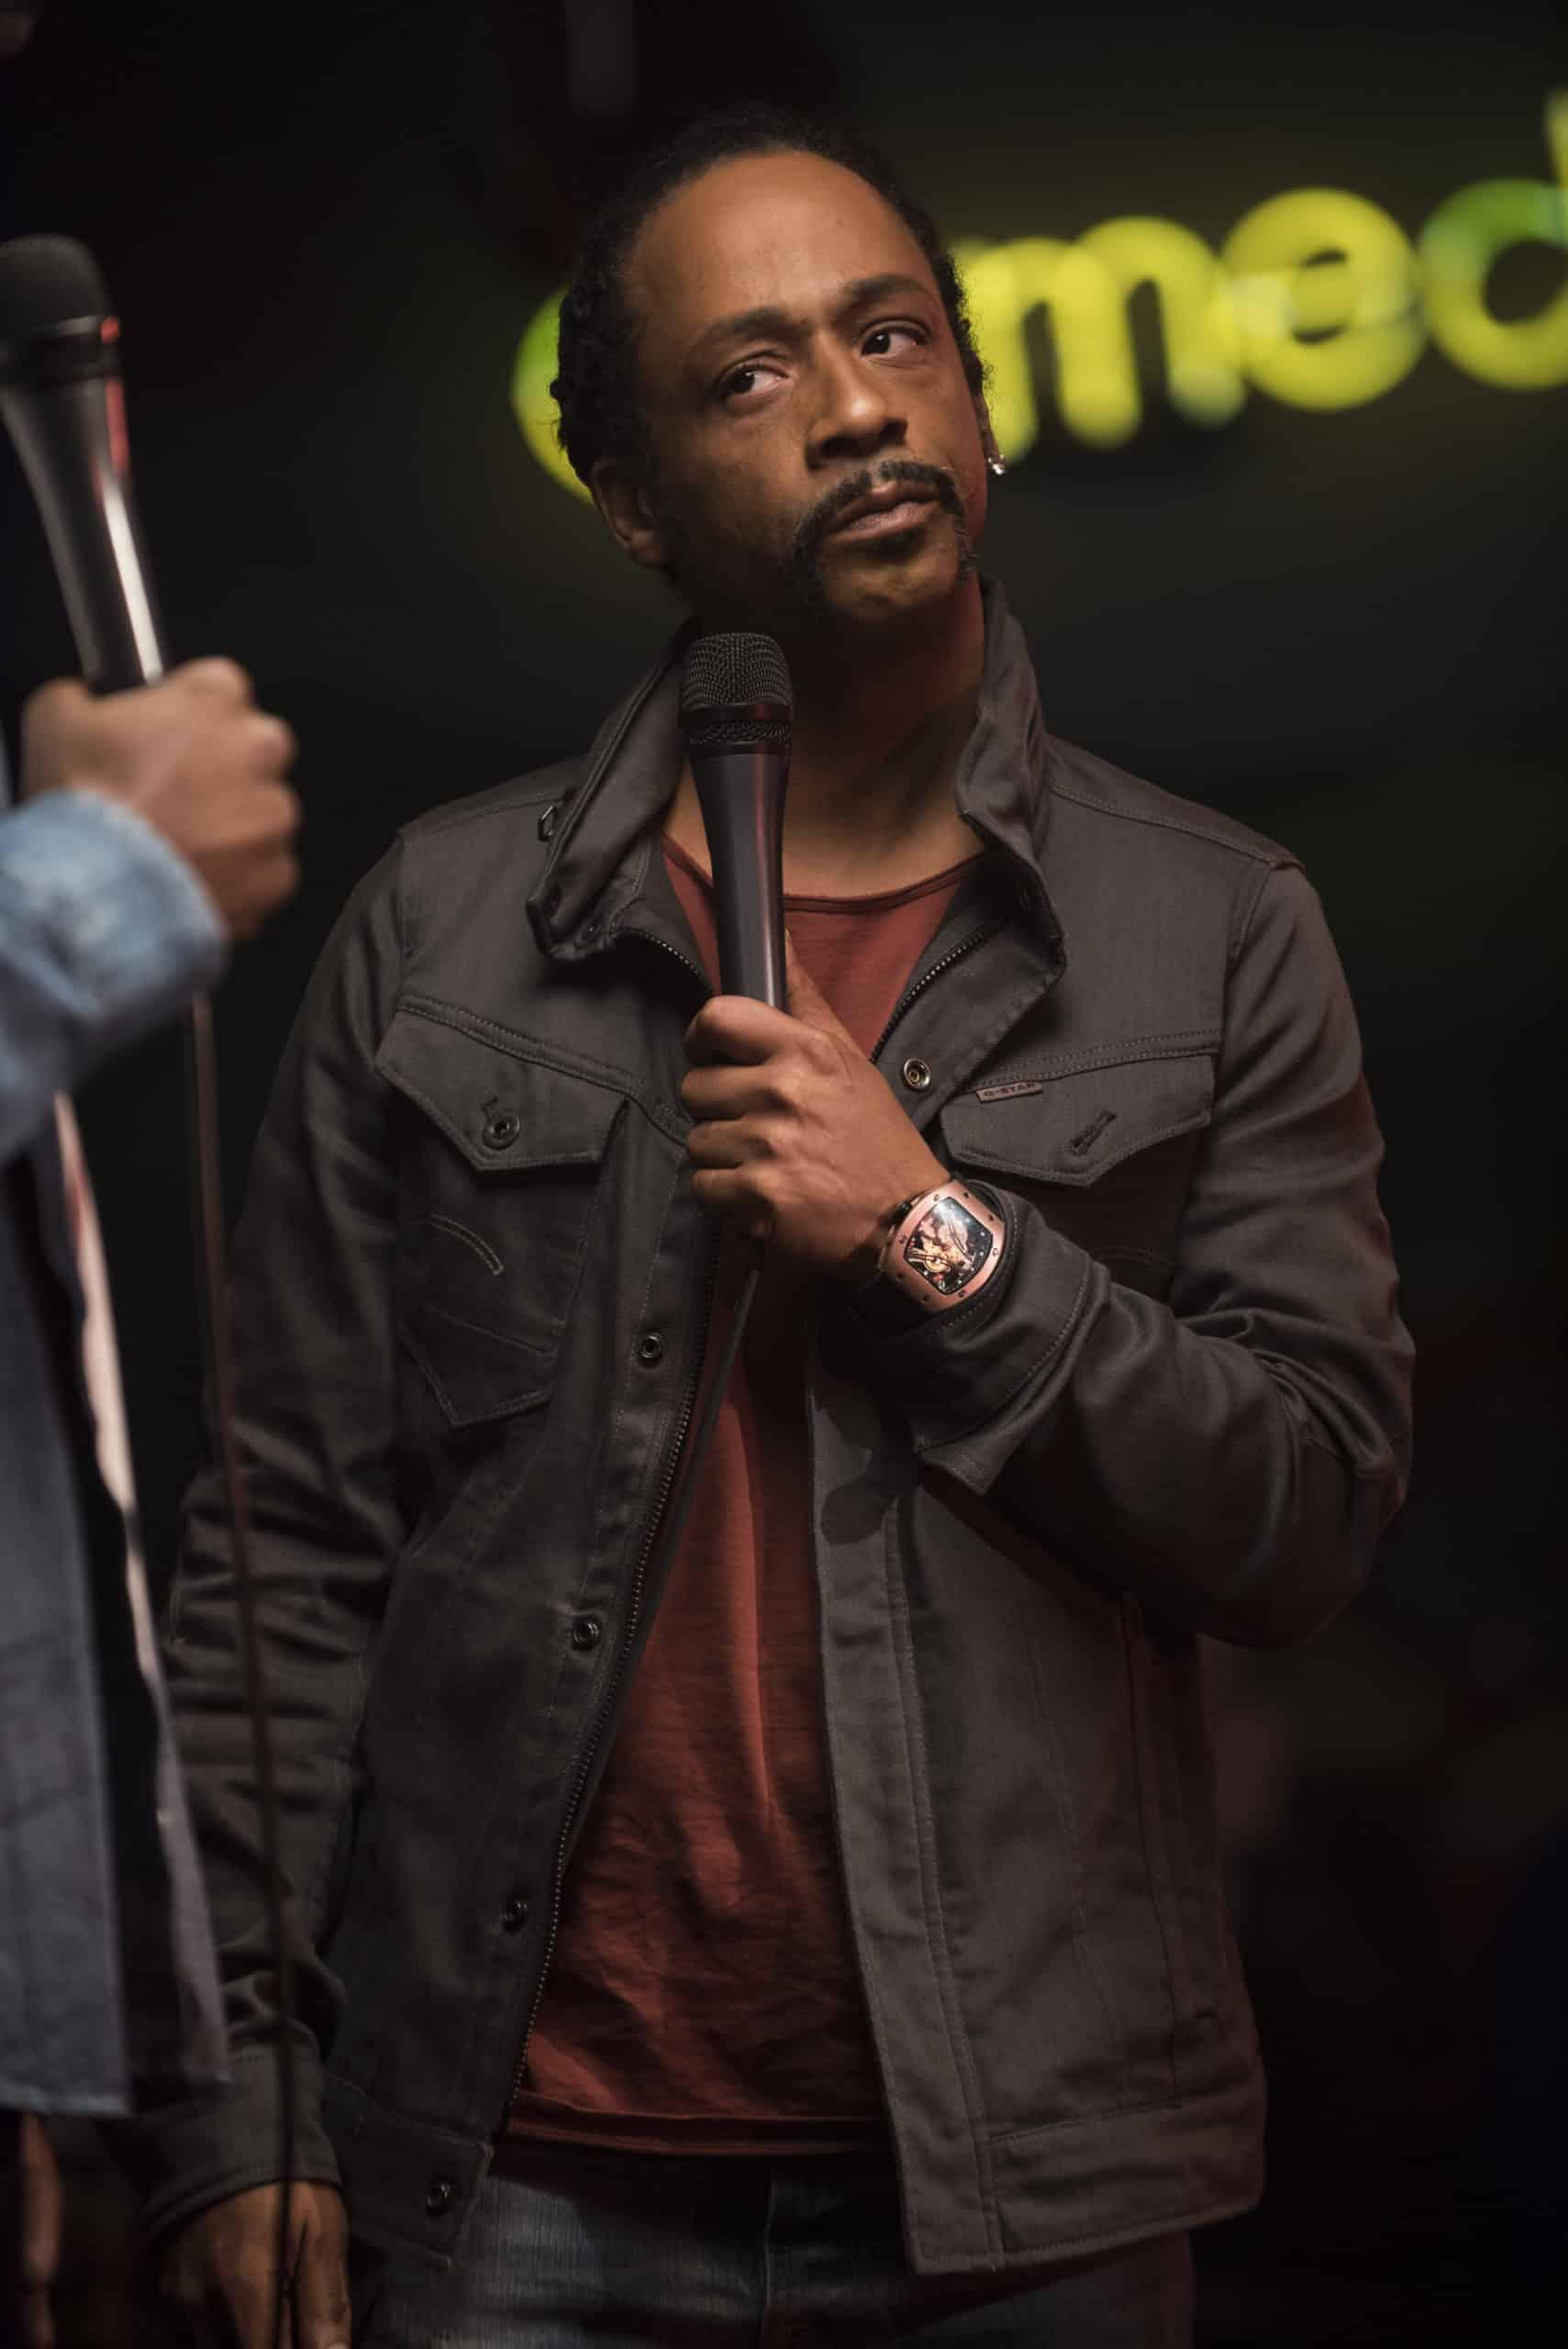 Marques (Katt Williams) interrupting Deandre's set and calling him out.